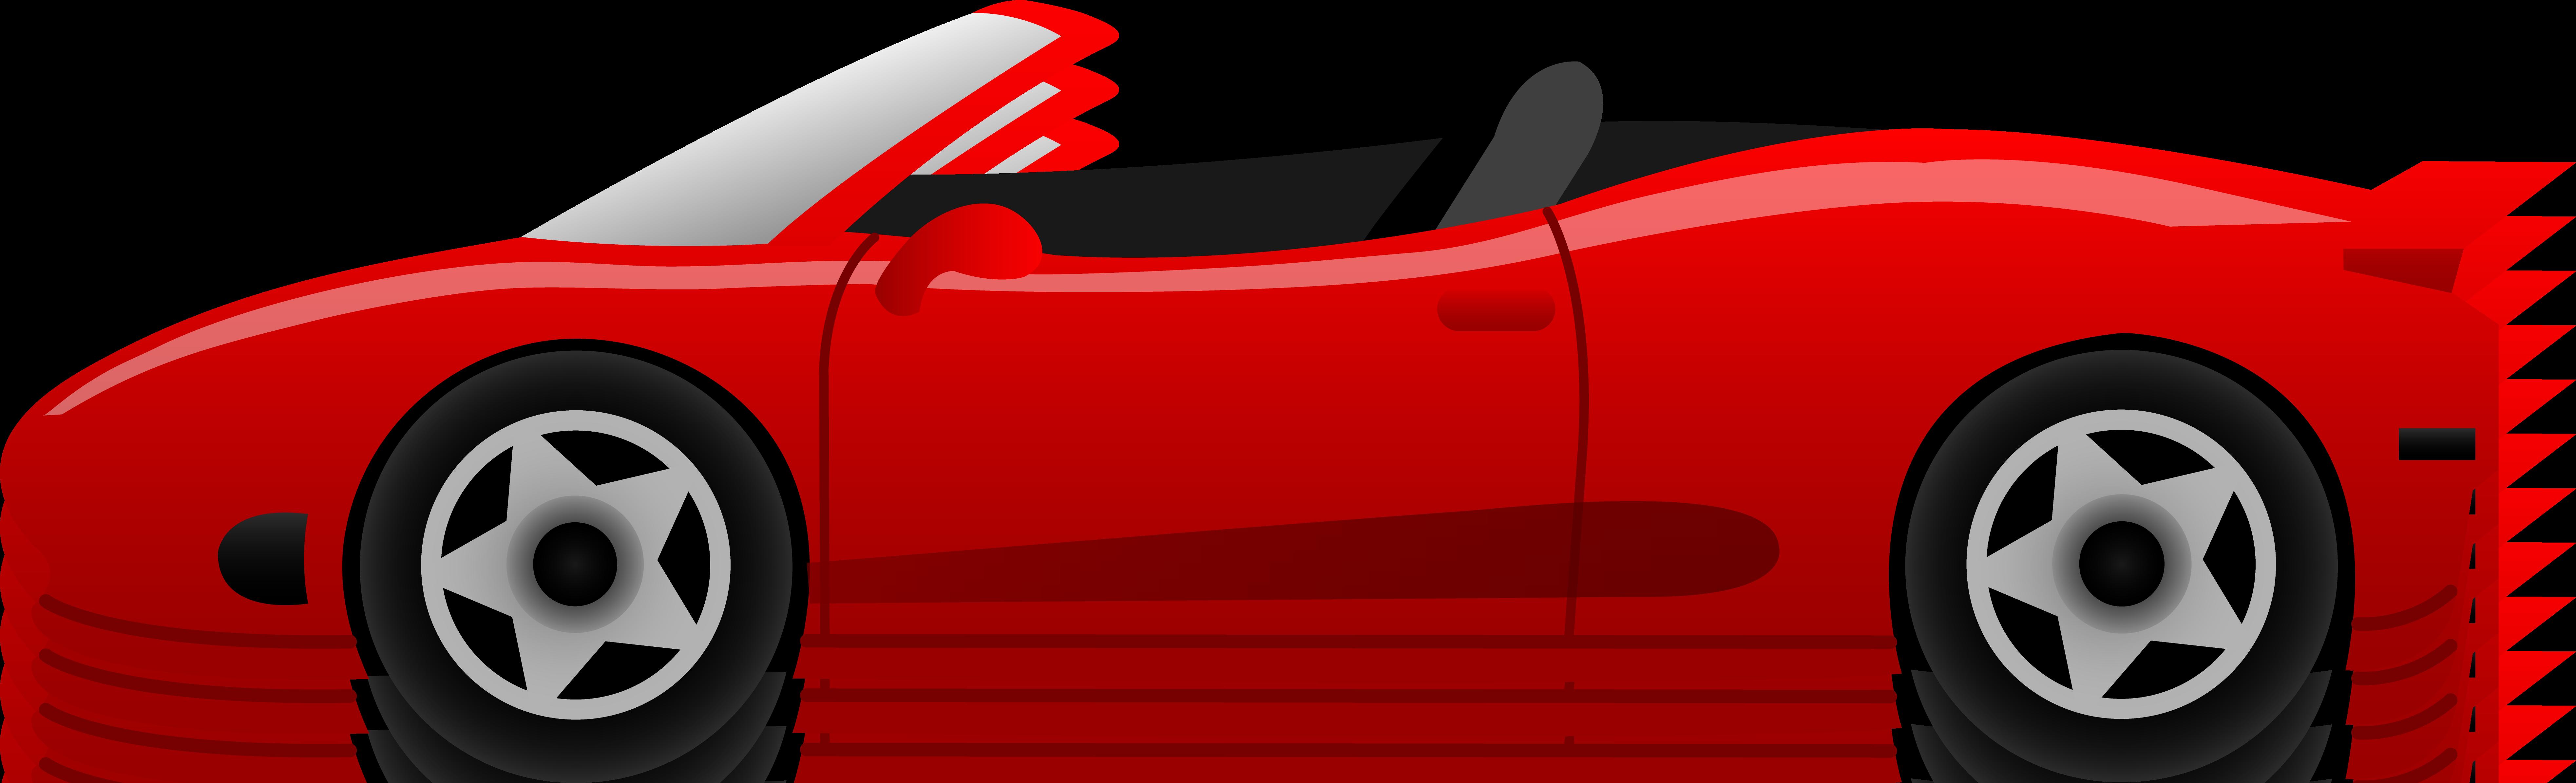 jpg download Car panda free images. Minivan clipart red suv.